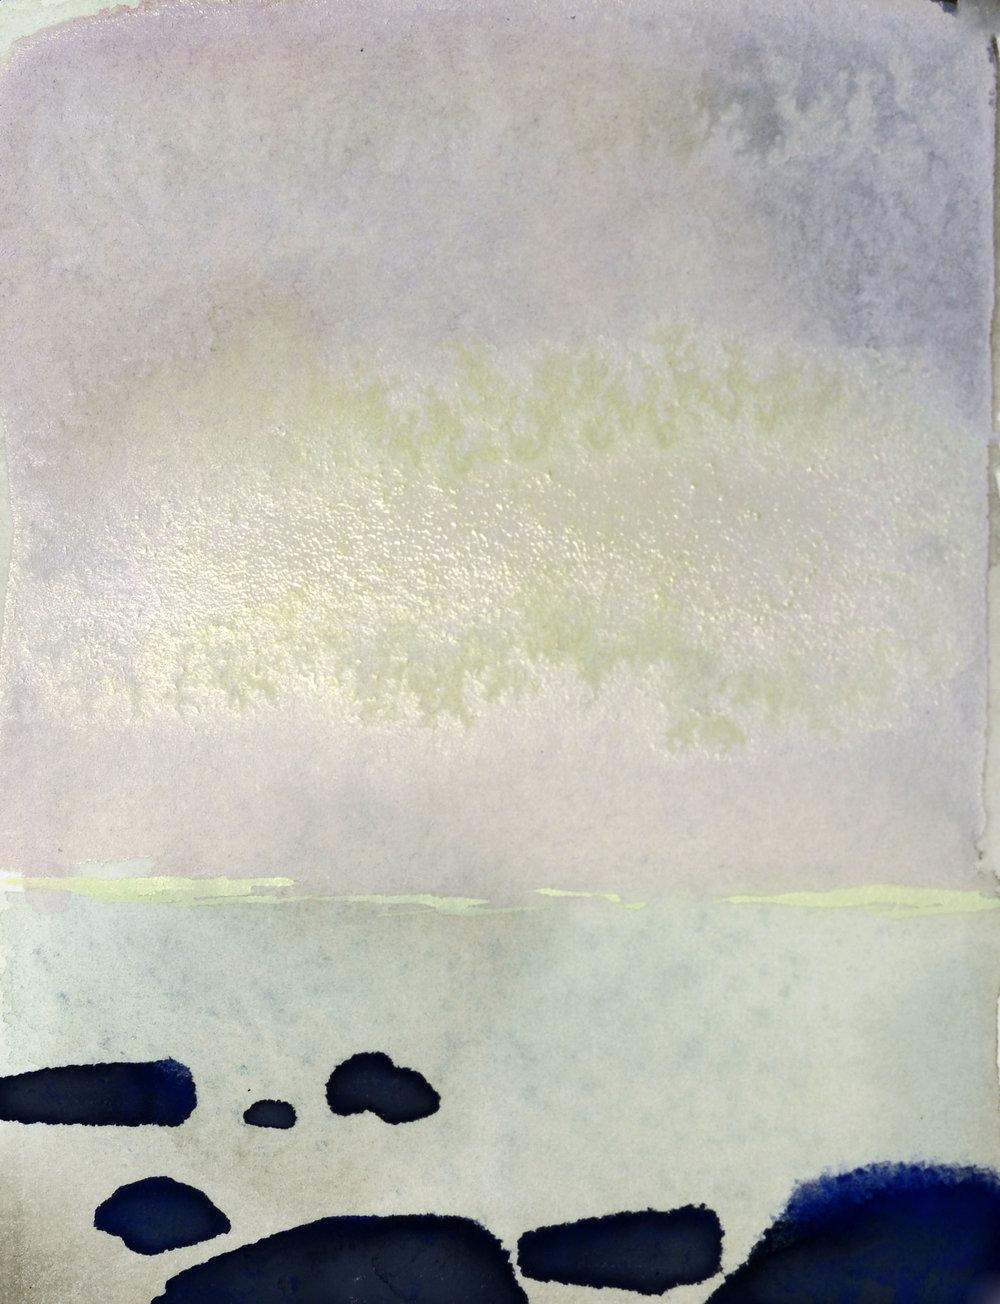 Rebecca_Kinkead_Rocks and Water no.2_4x3 inset on 11x 7.5 paper.jpg